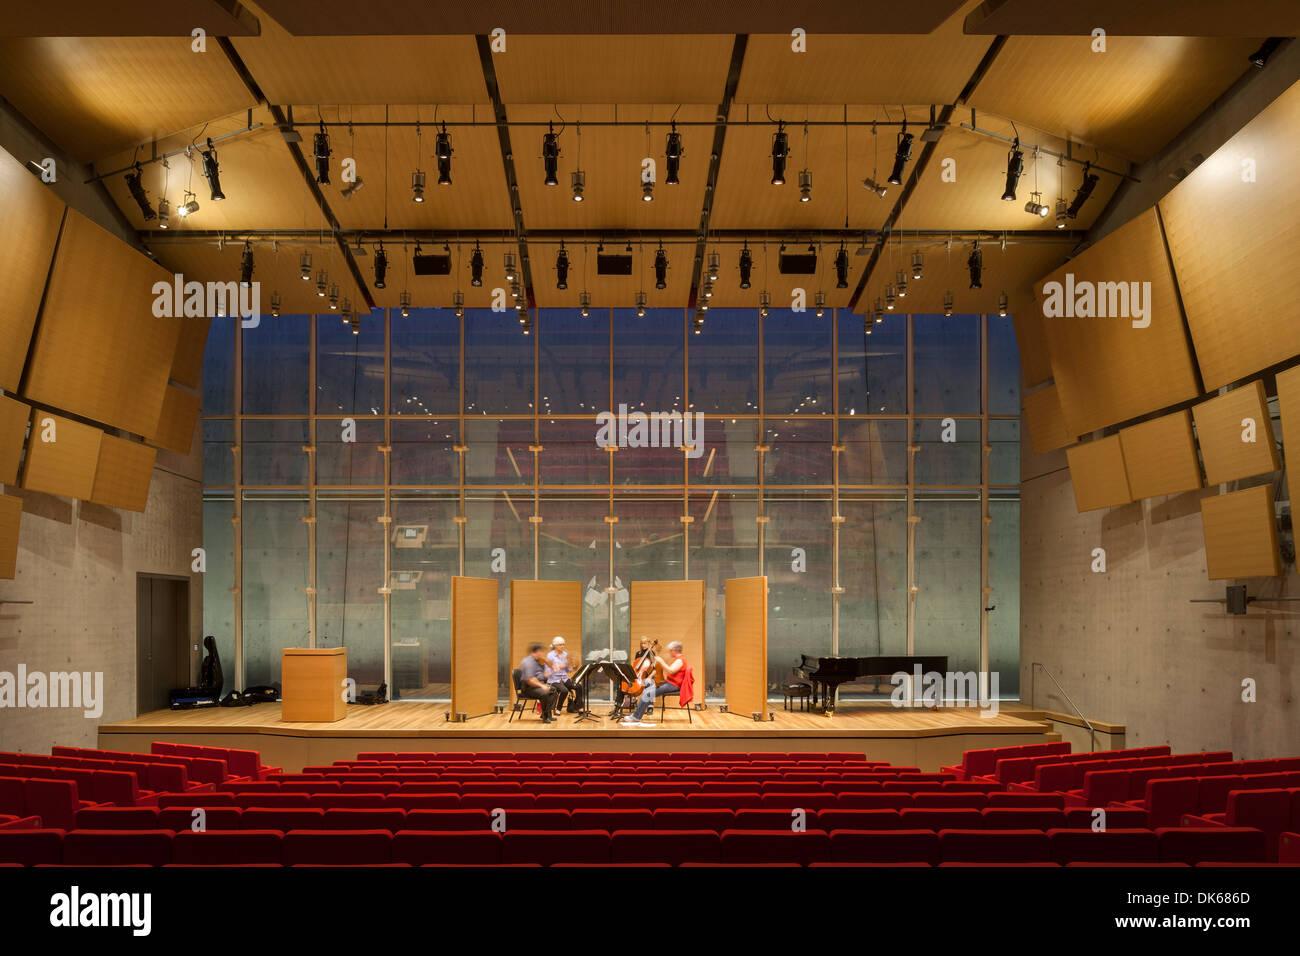 Renzo Piano Nato A auditorium lingotto renzo piano kimbell